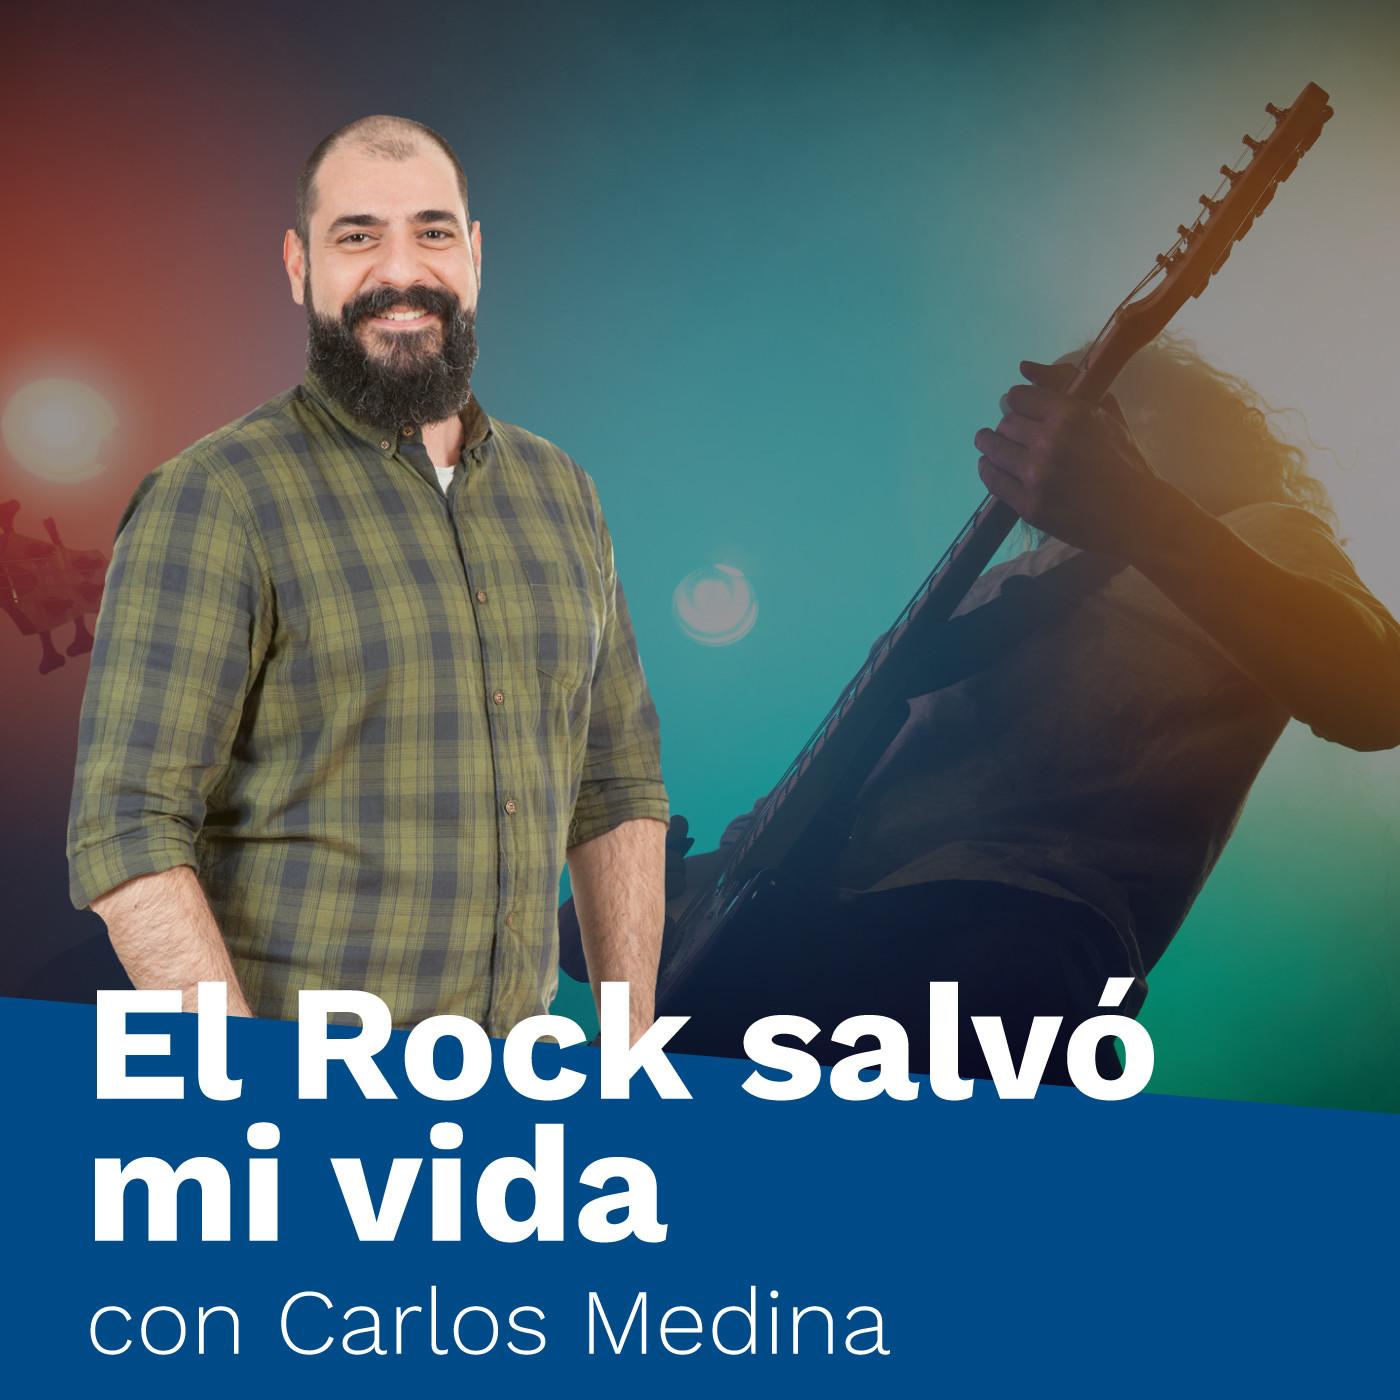 El rock salvó mi vida